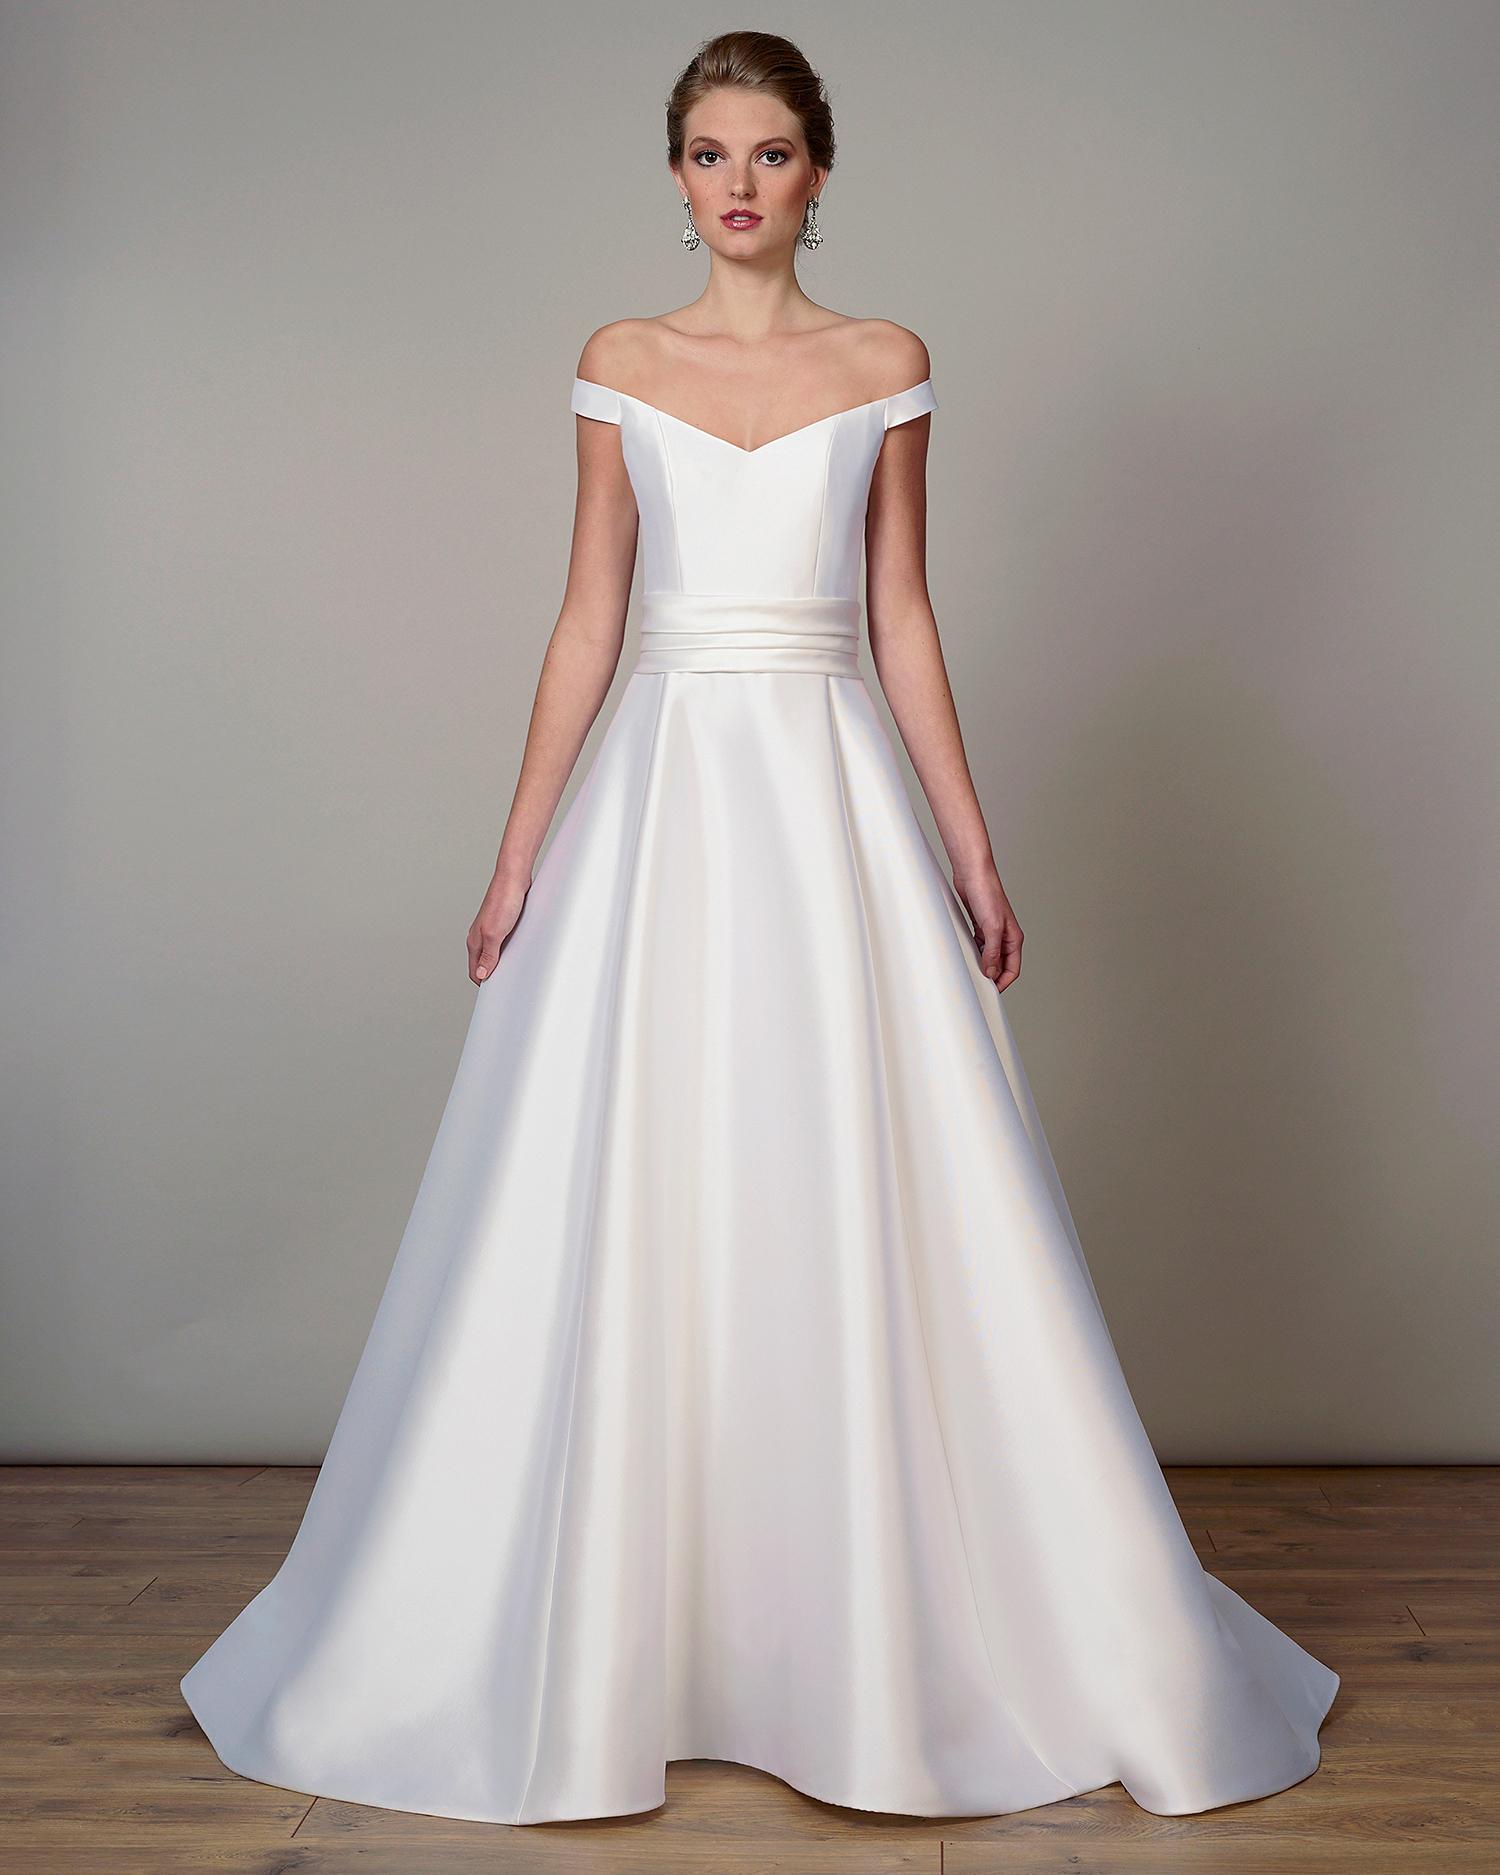 liancarlo wedding dress spring 2019 off-the-shoulder sash a-line